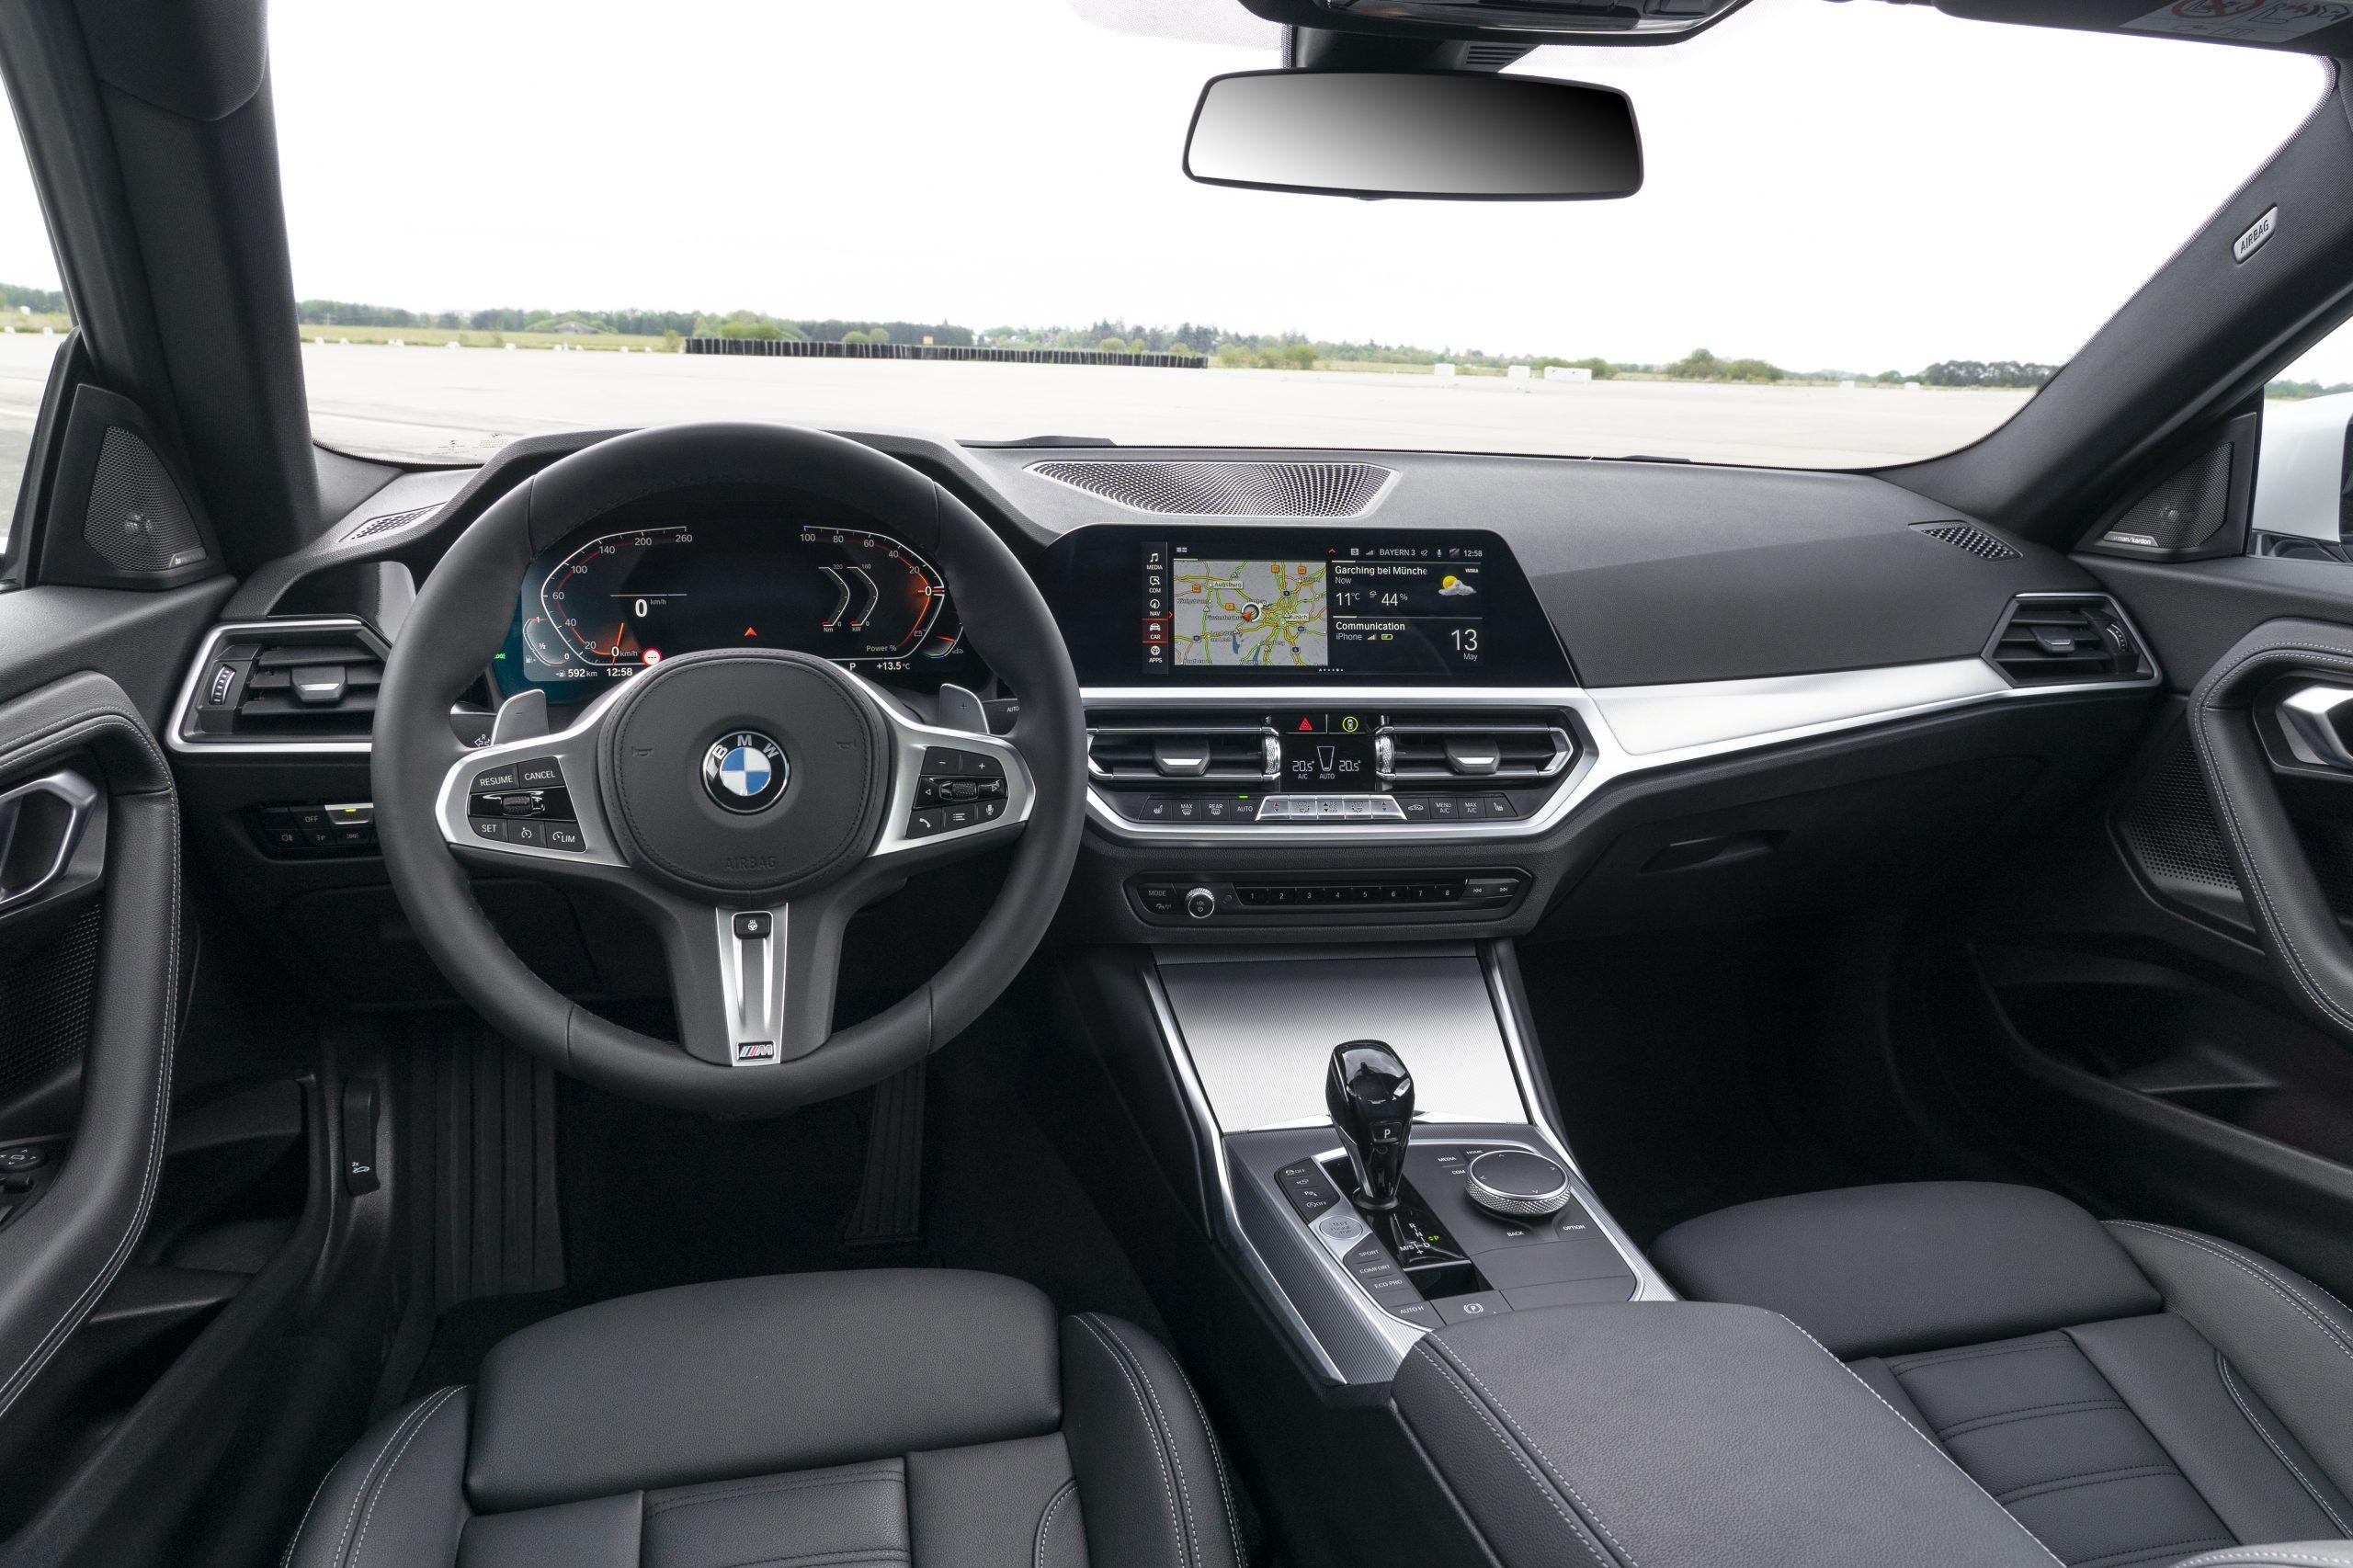 P90428479 highRes scaled Αυτή είναι η νέα BMW Σειρά 2 Coupe BMW, Bmw 2, BMW Σειρά 2, zblog, ειδήσεις, Νέα, Σειρά 2